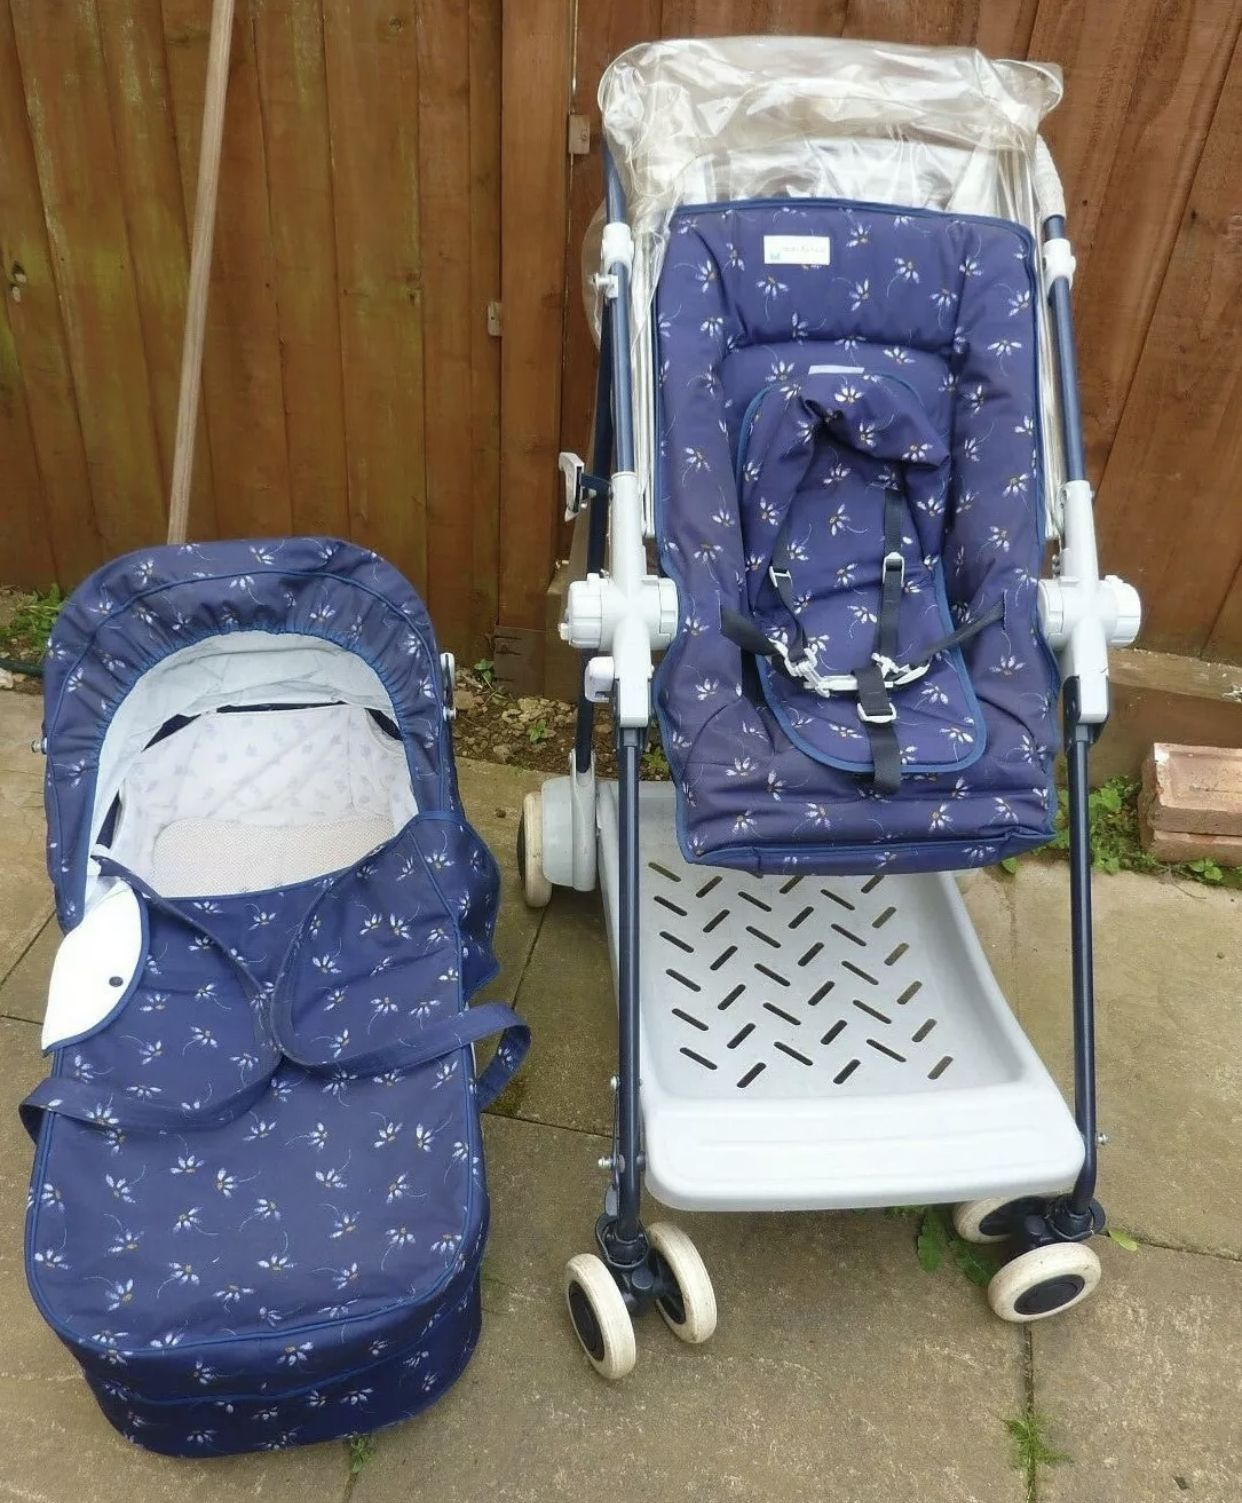 Maclaren Superdreamer Baby strollers, Baby, Stroller